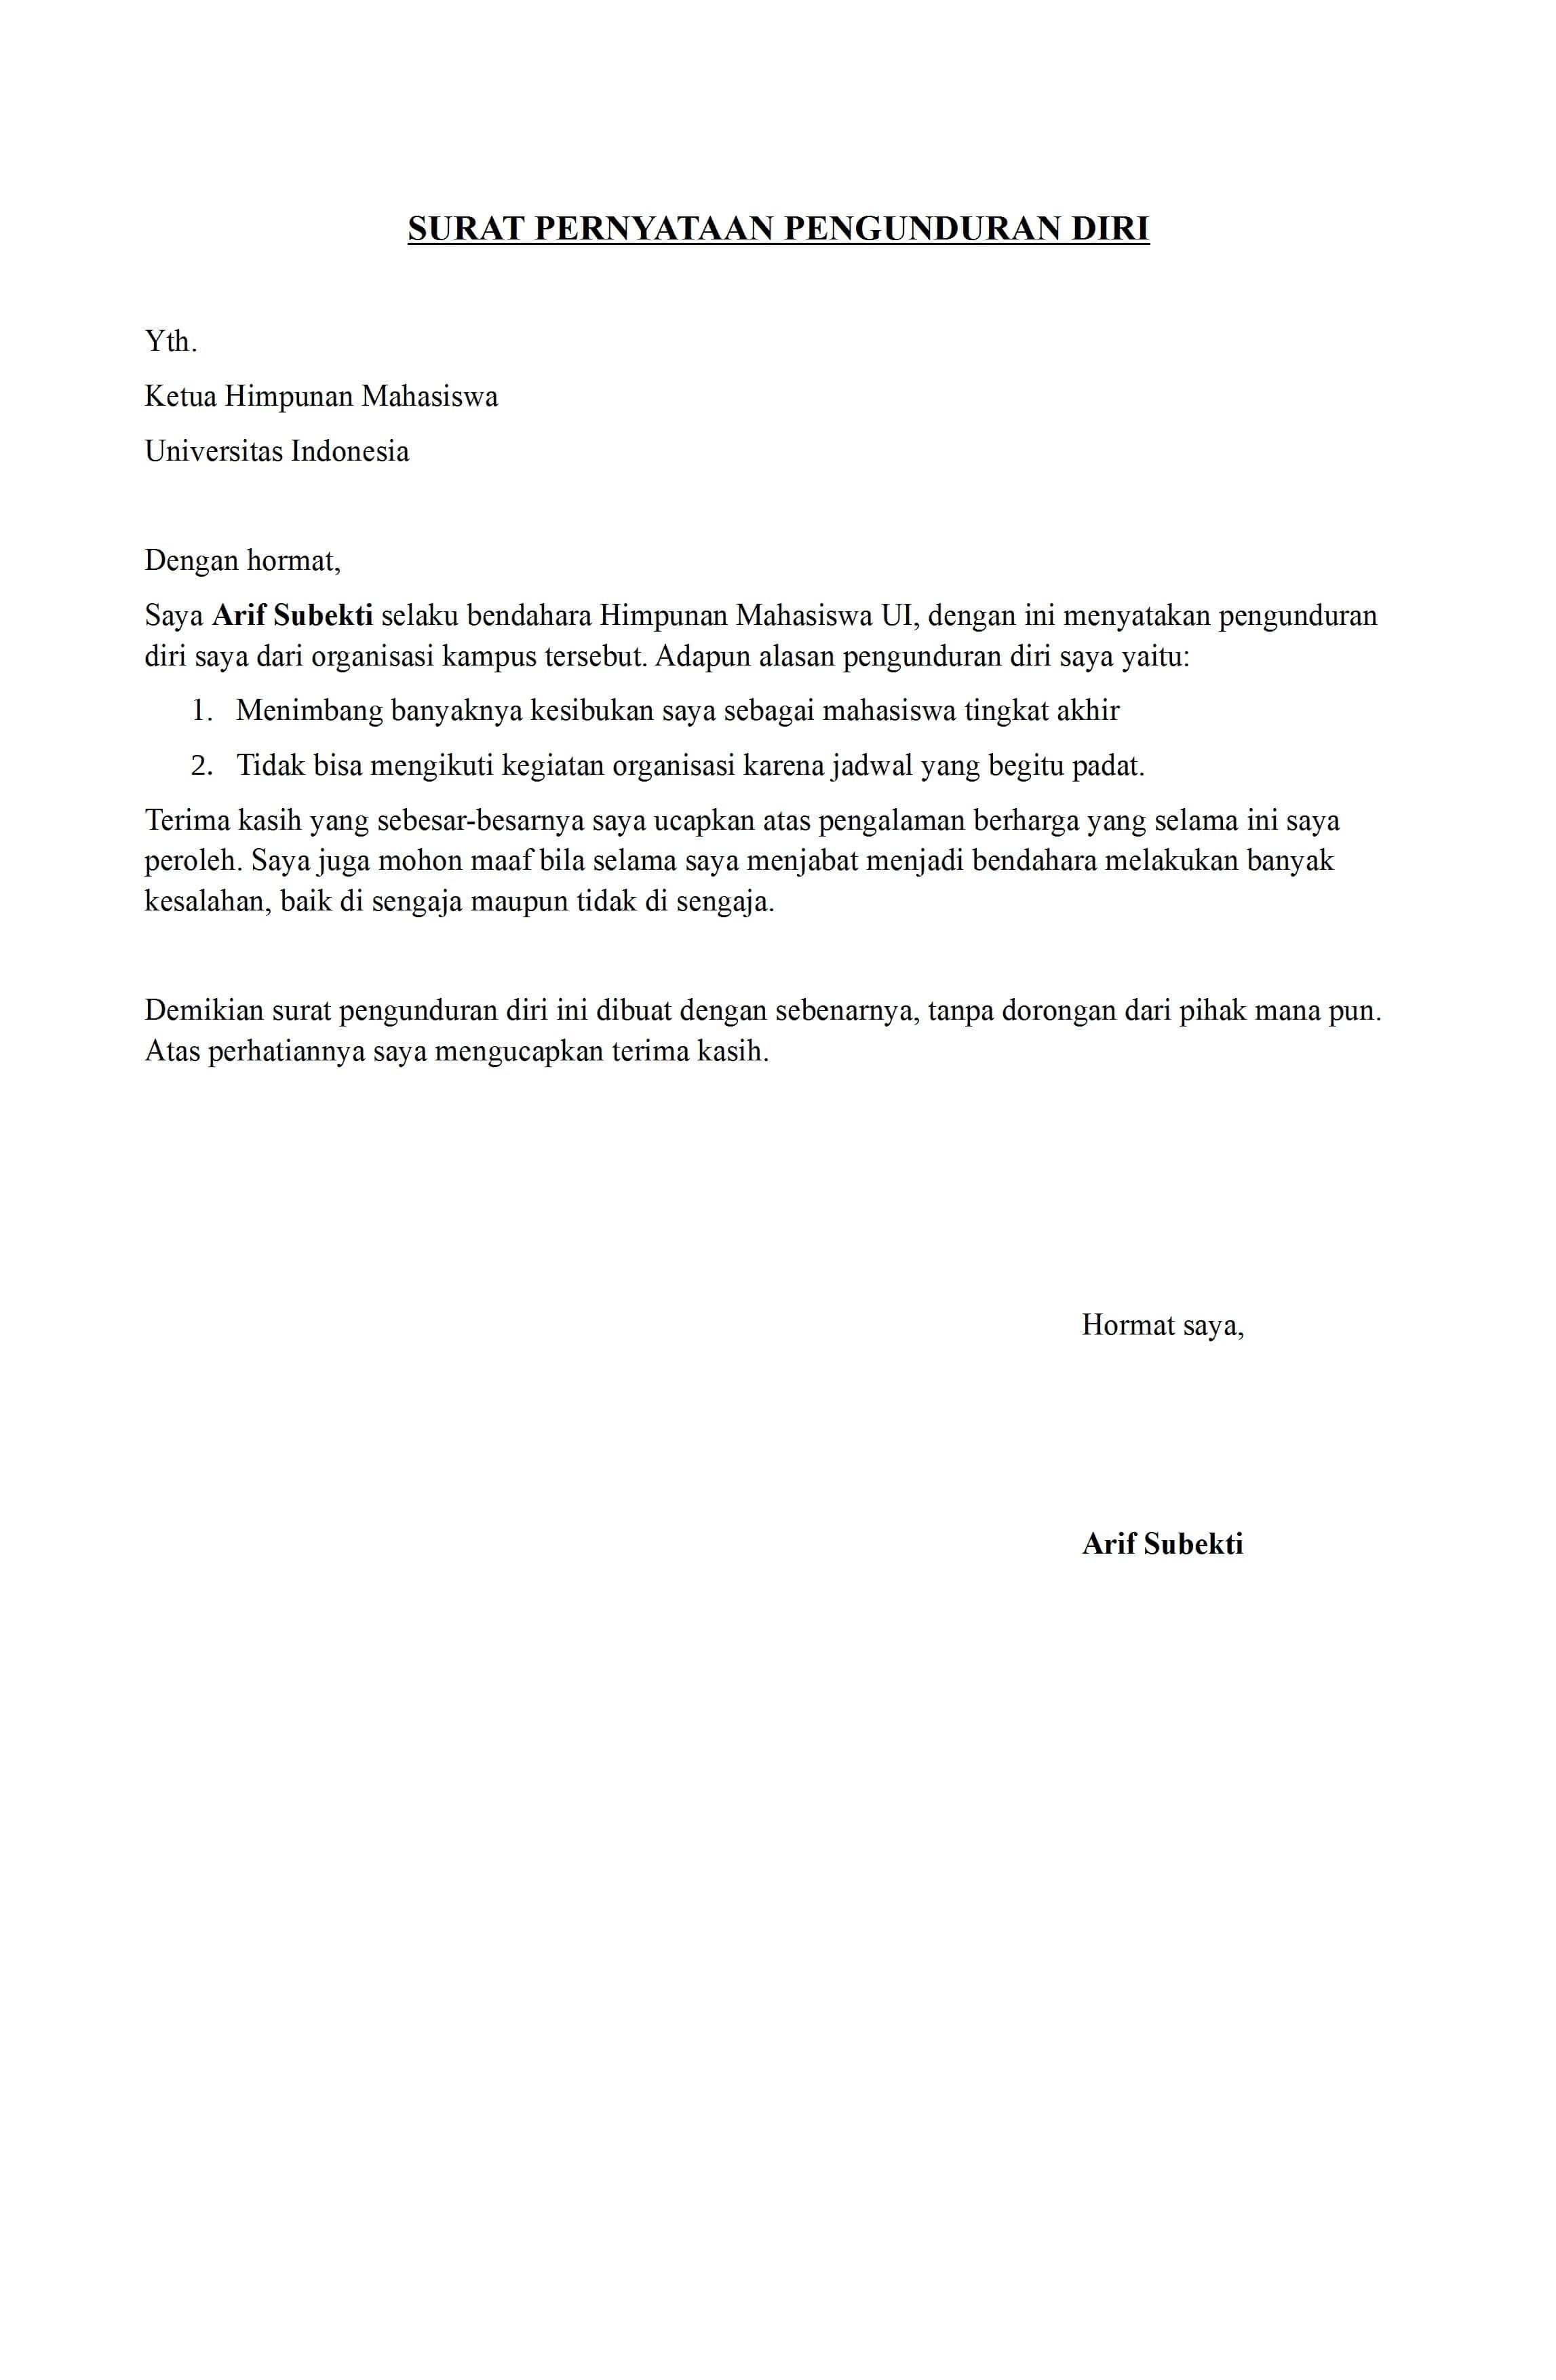 Contoh Format Surat Pengunduran Diri Mahasiswa - Kumpulan ...